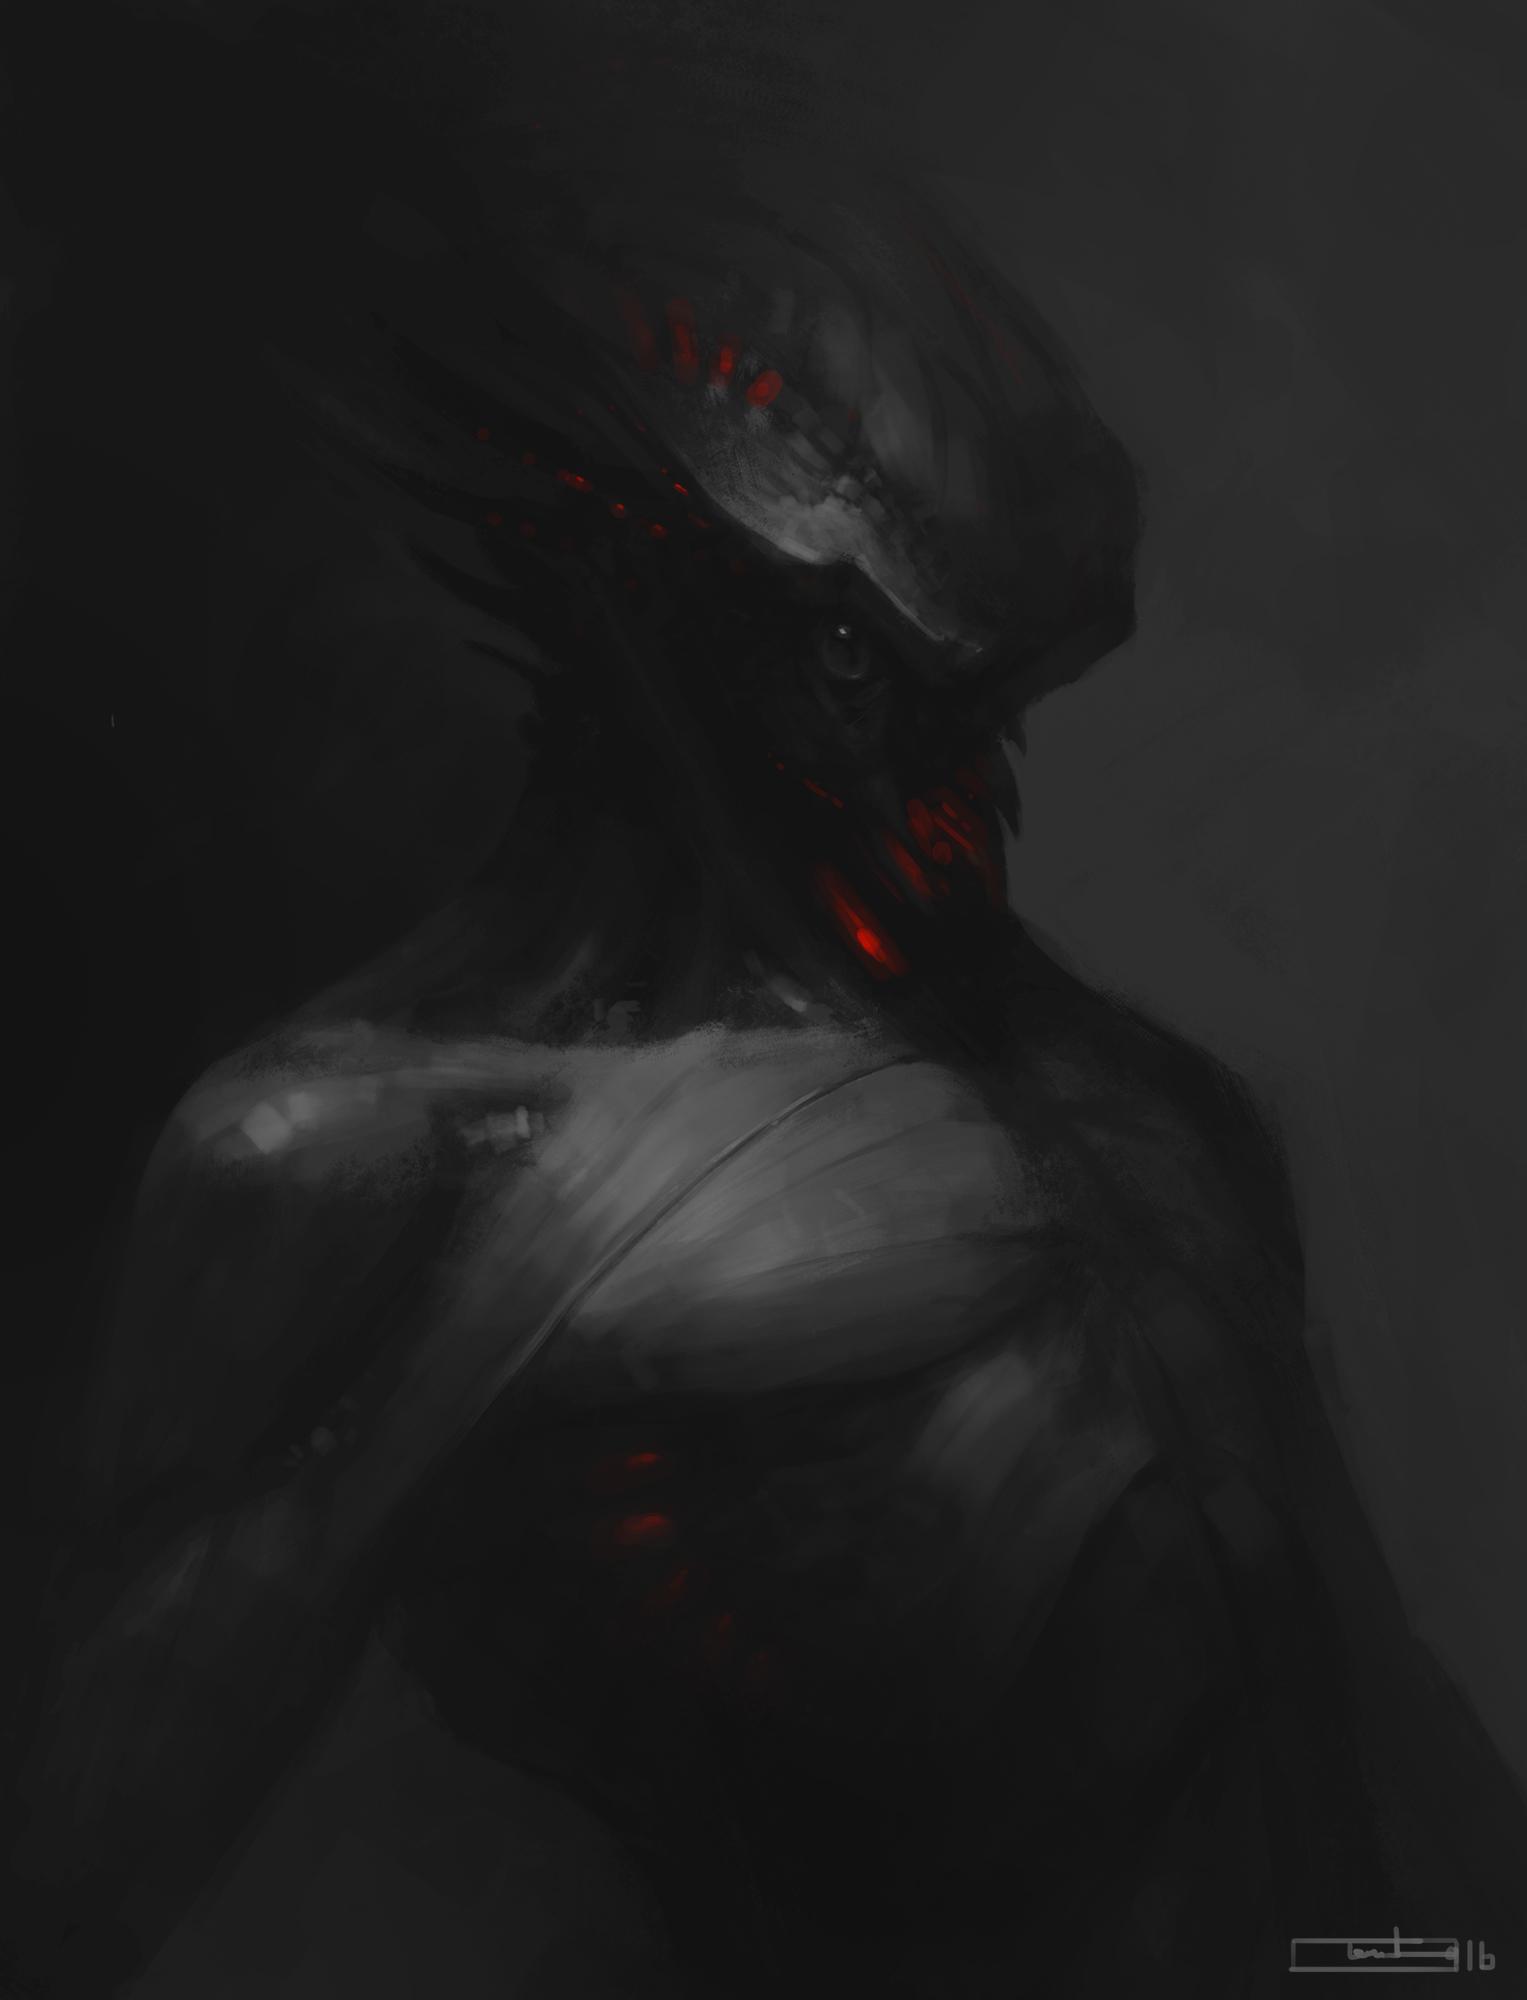 Creature 01 by MrTomLong